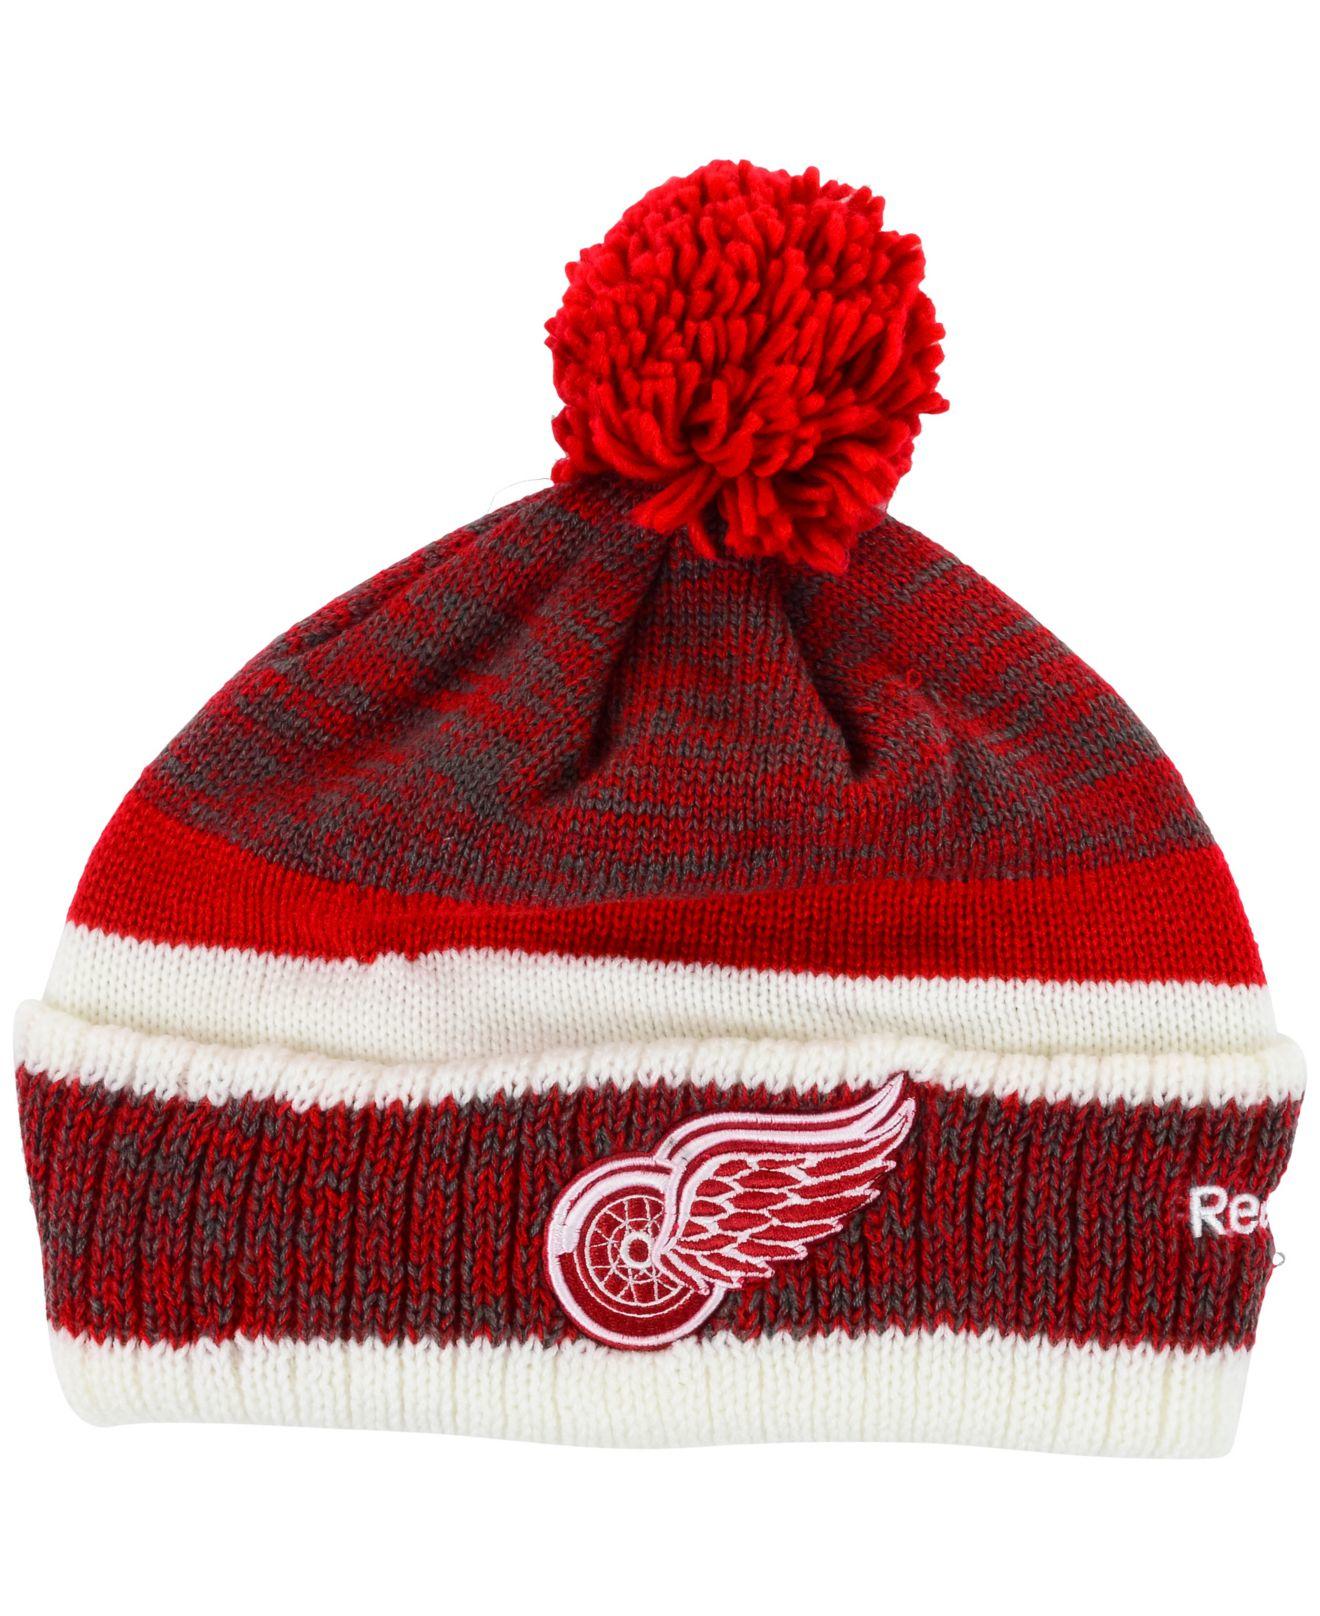 arrives a47d6 0bac7 Lyst - Reebok Detroit Red Wings Pom Knit Hat in Red for Men